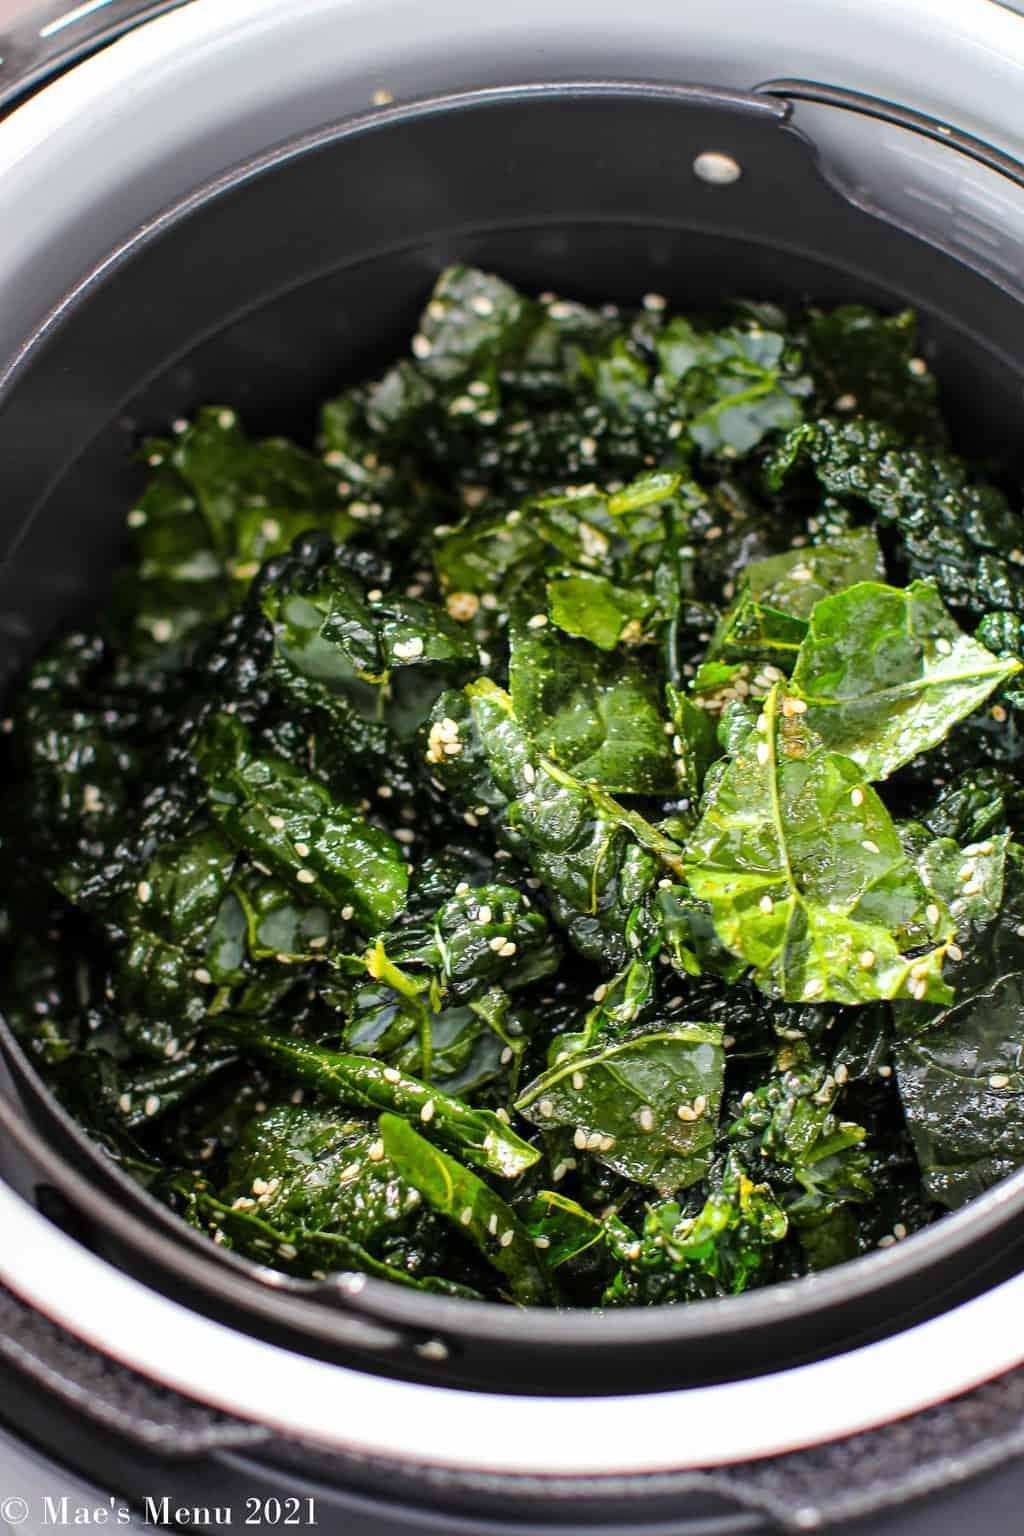 Kale chips in an air fryer